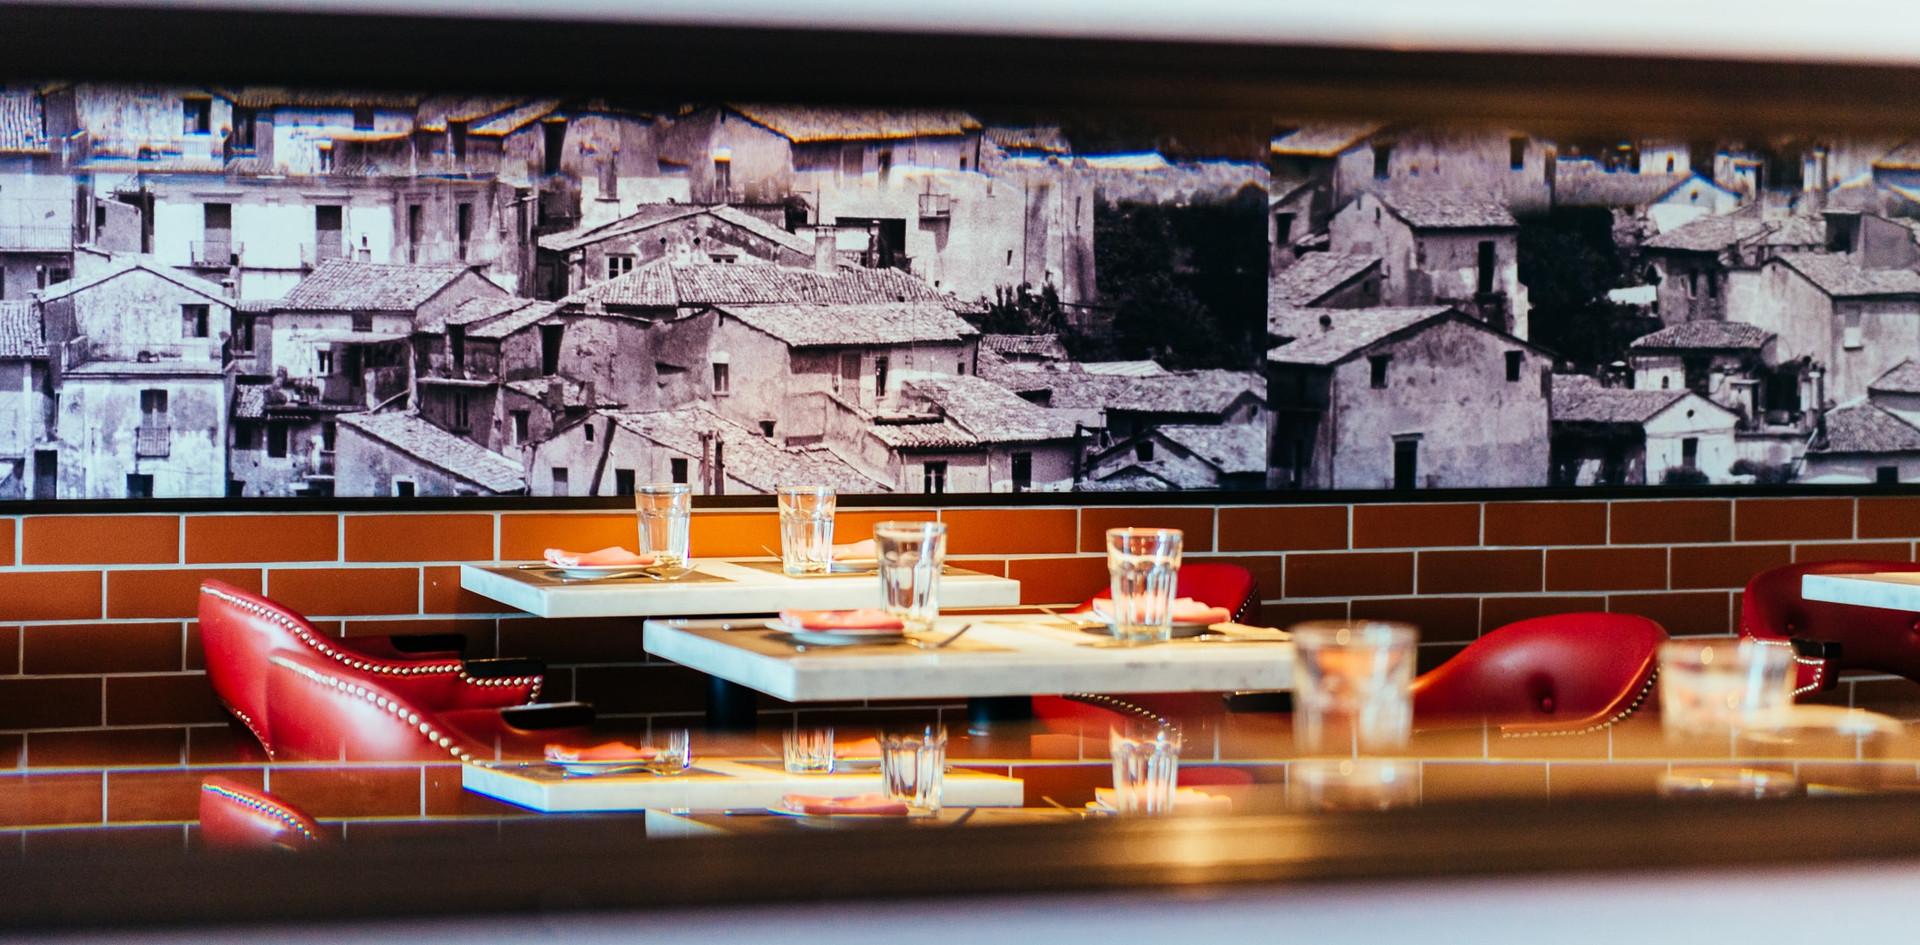 Latteria Mozzarella Bar_Indoor wall.jpg